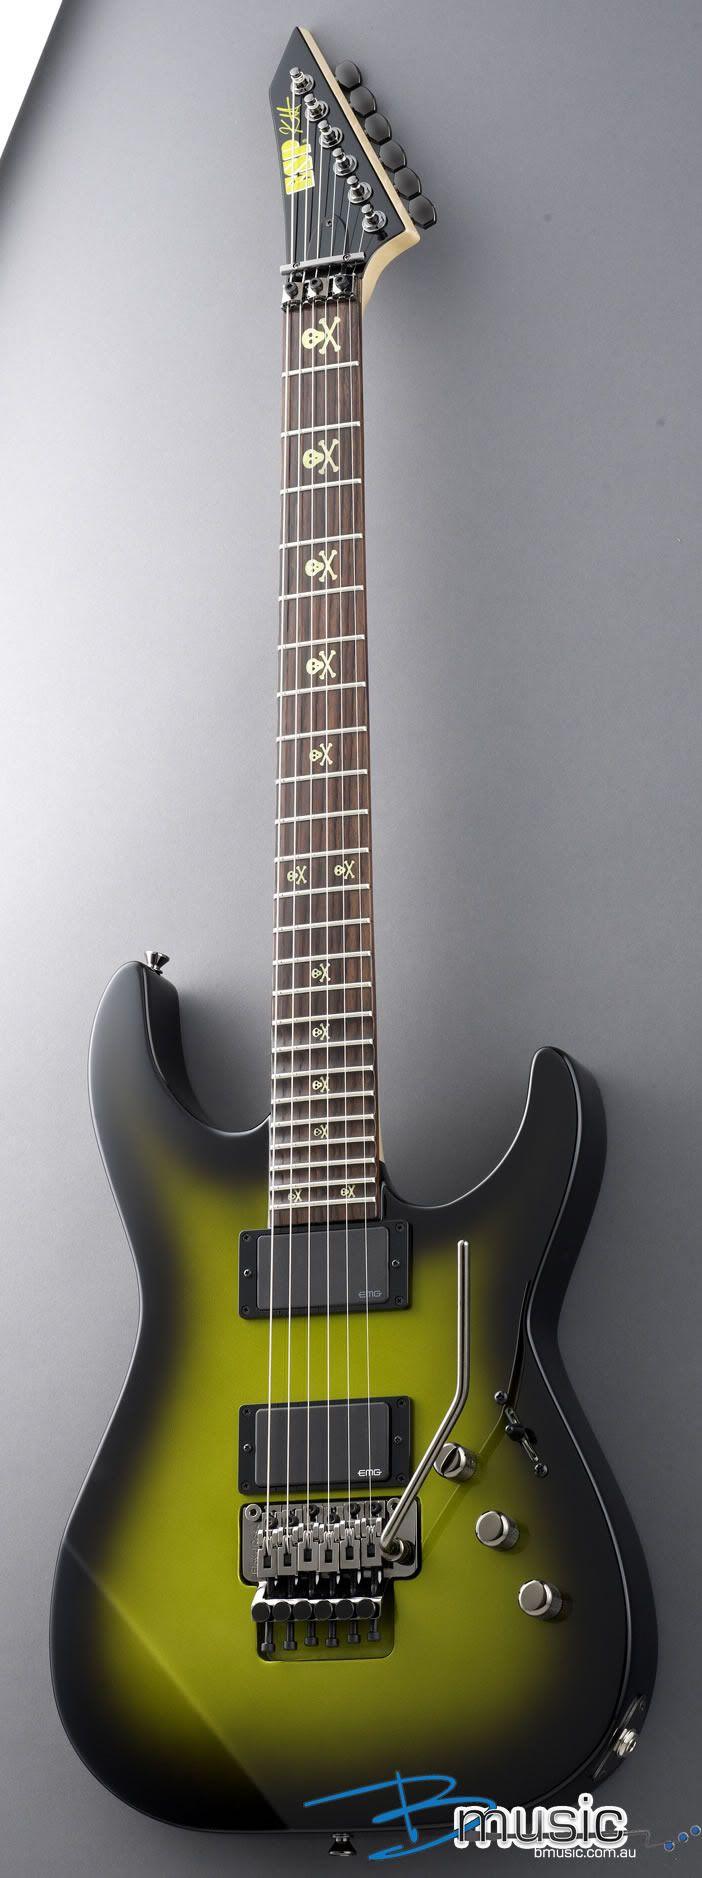 872 best Guitars & Music images on Pinterest | Guitars, Music guitar ...